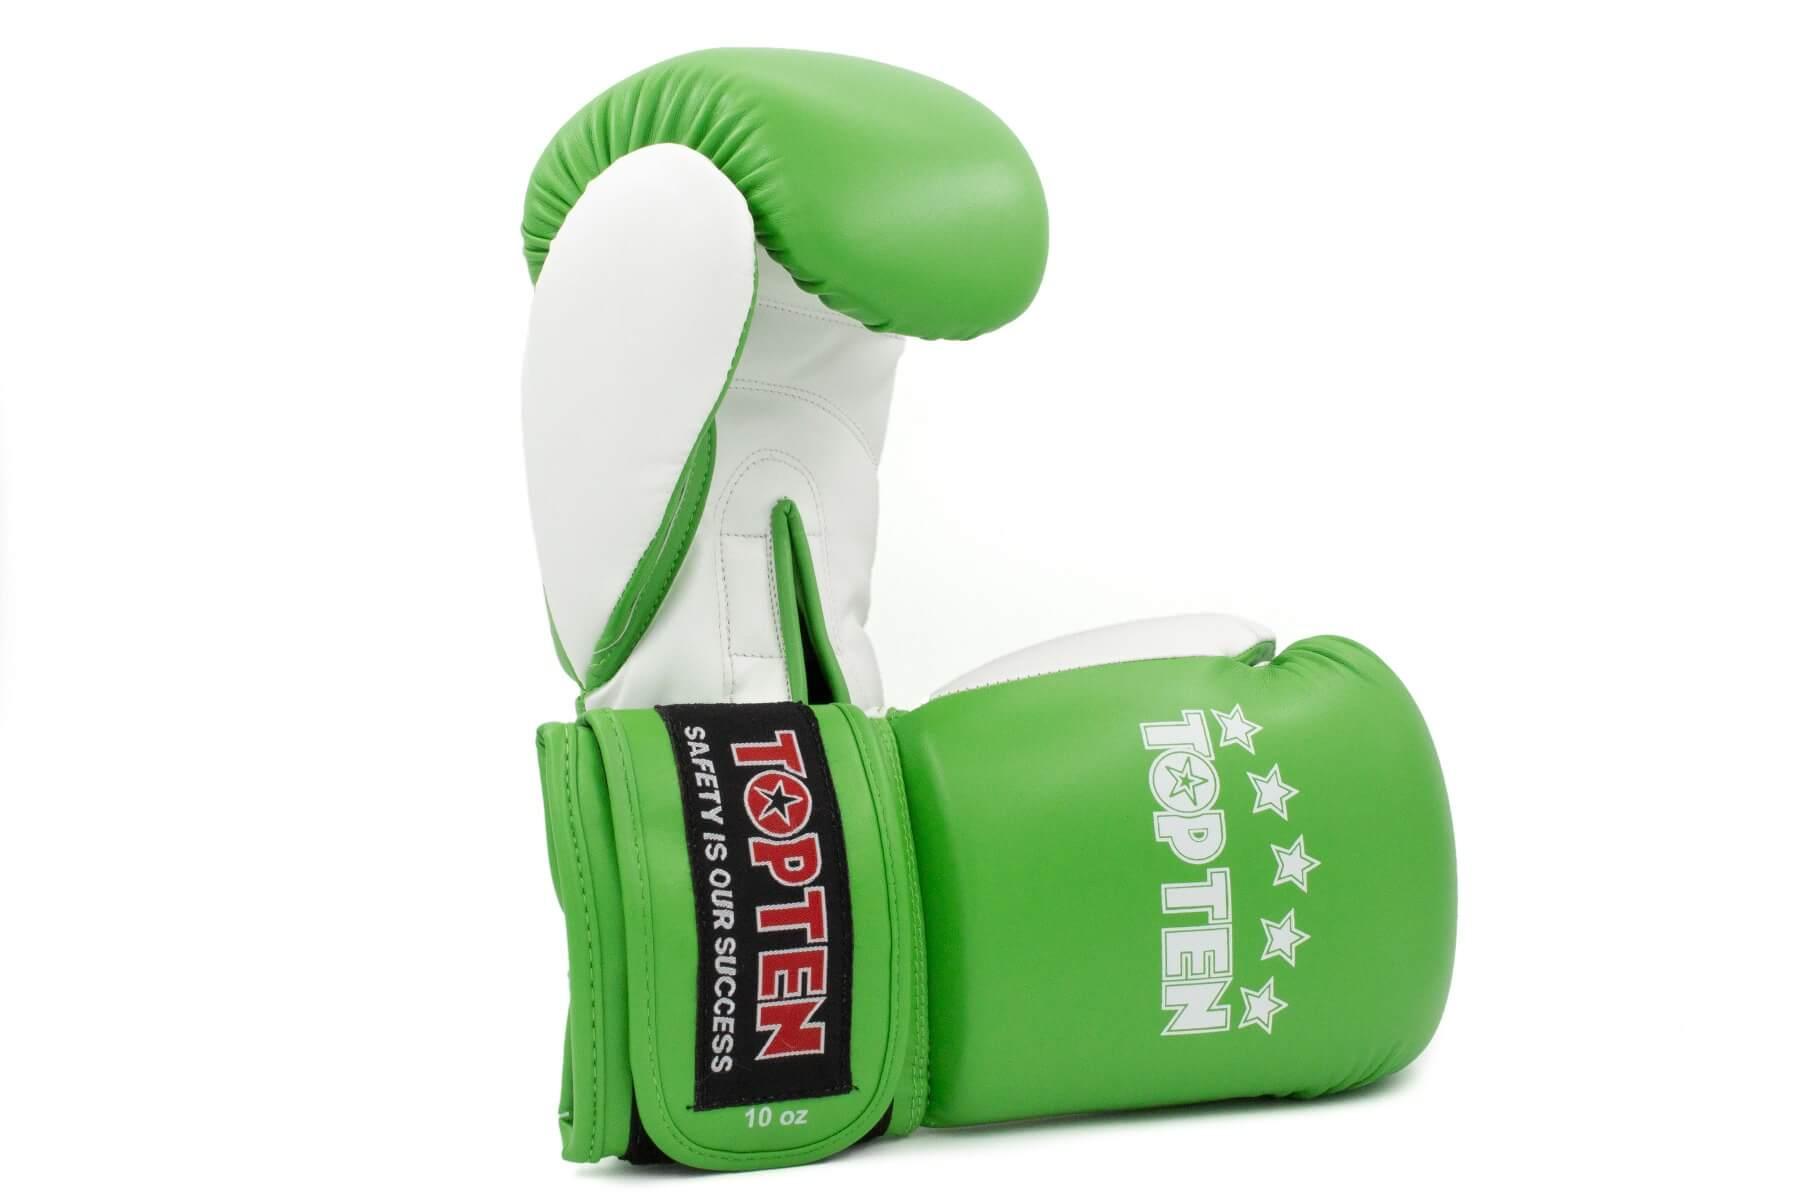 Boxhandschuh NKII Grün